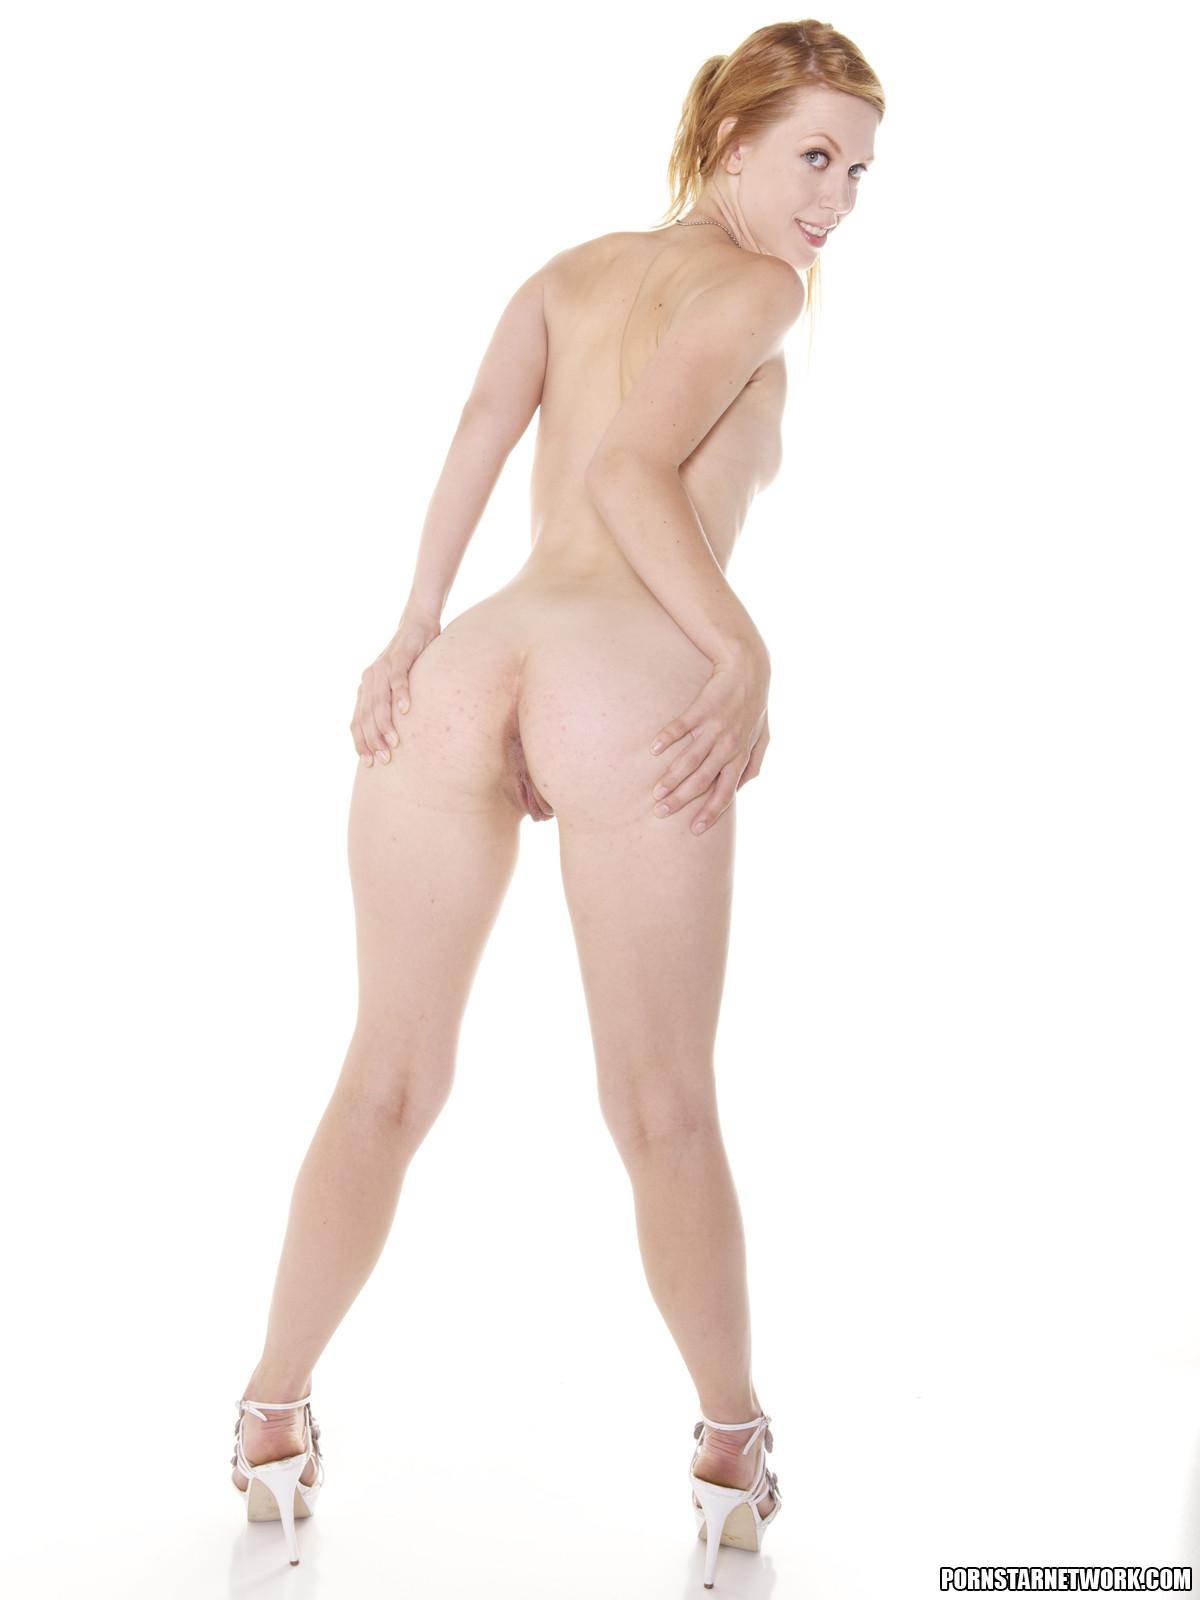 Mandingo Hardcore Women Doing Sex Porn